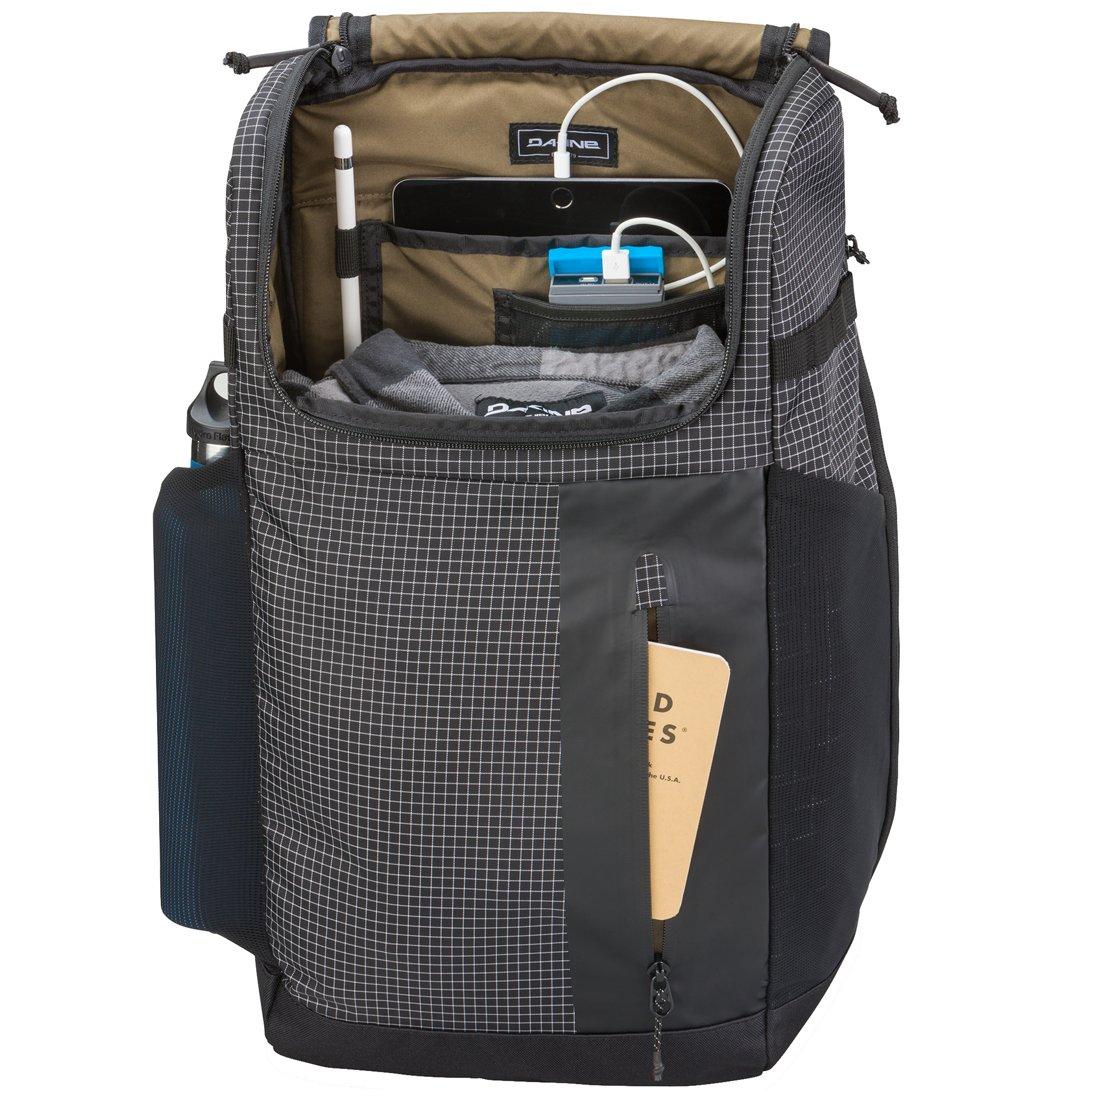 281faa2a3b30e Dakine Packs   Bags Concourse Rucksack 56 cm - koffer-direkt.de